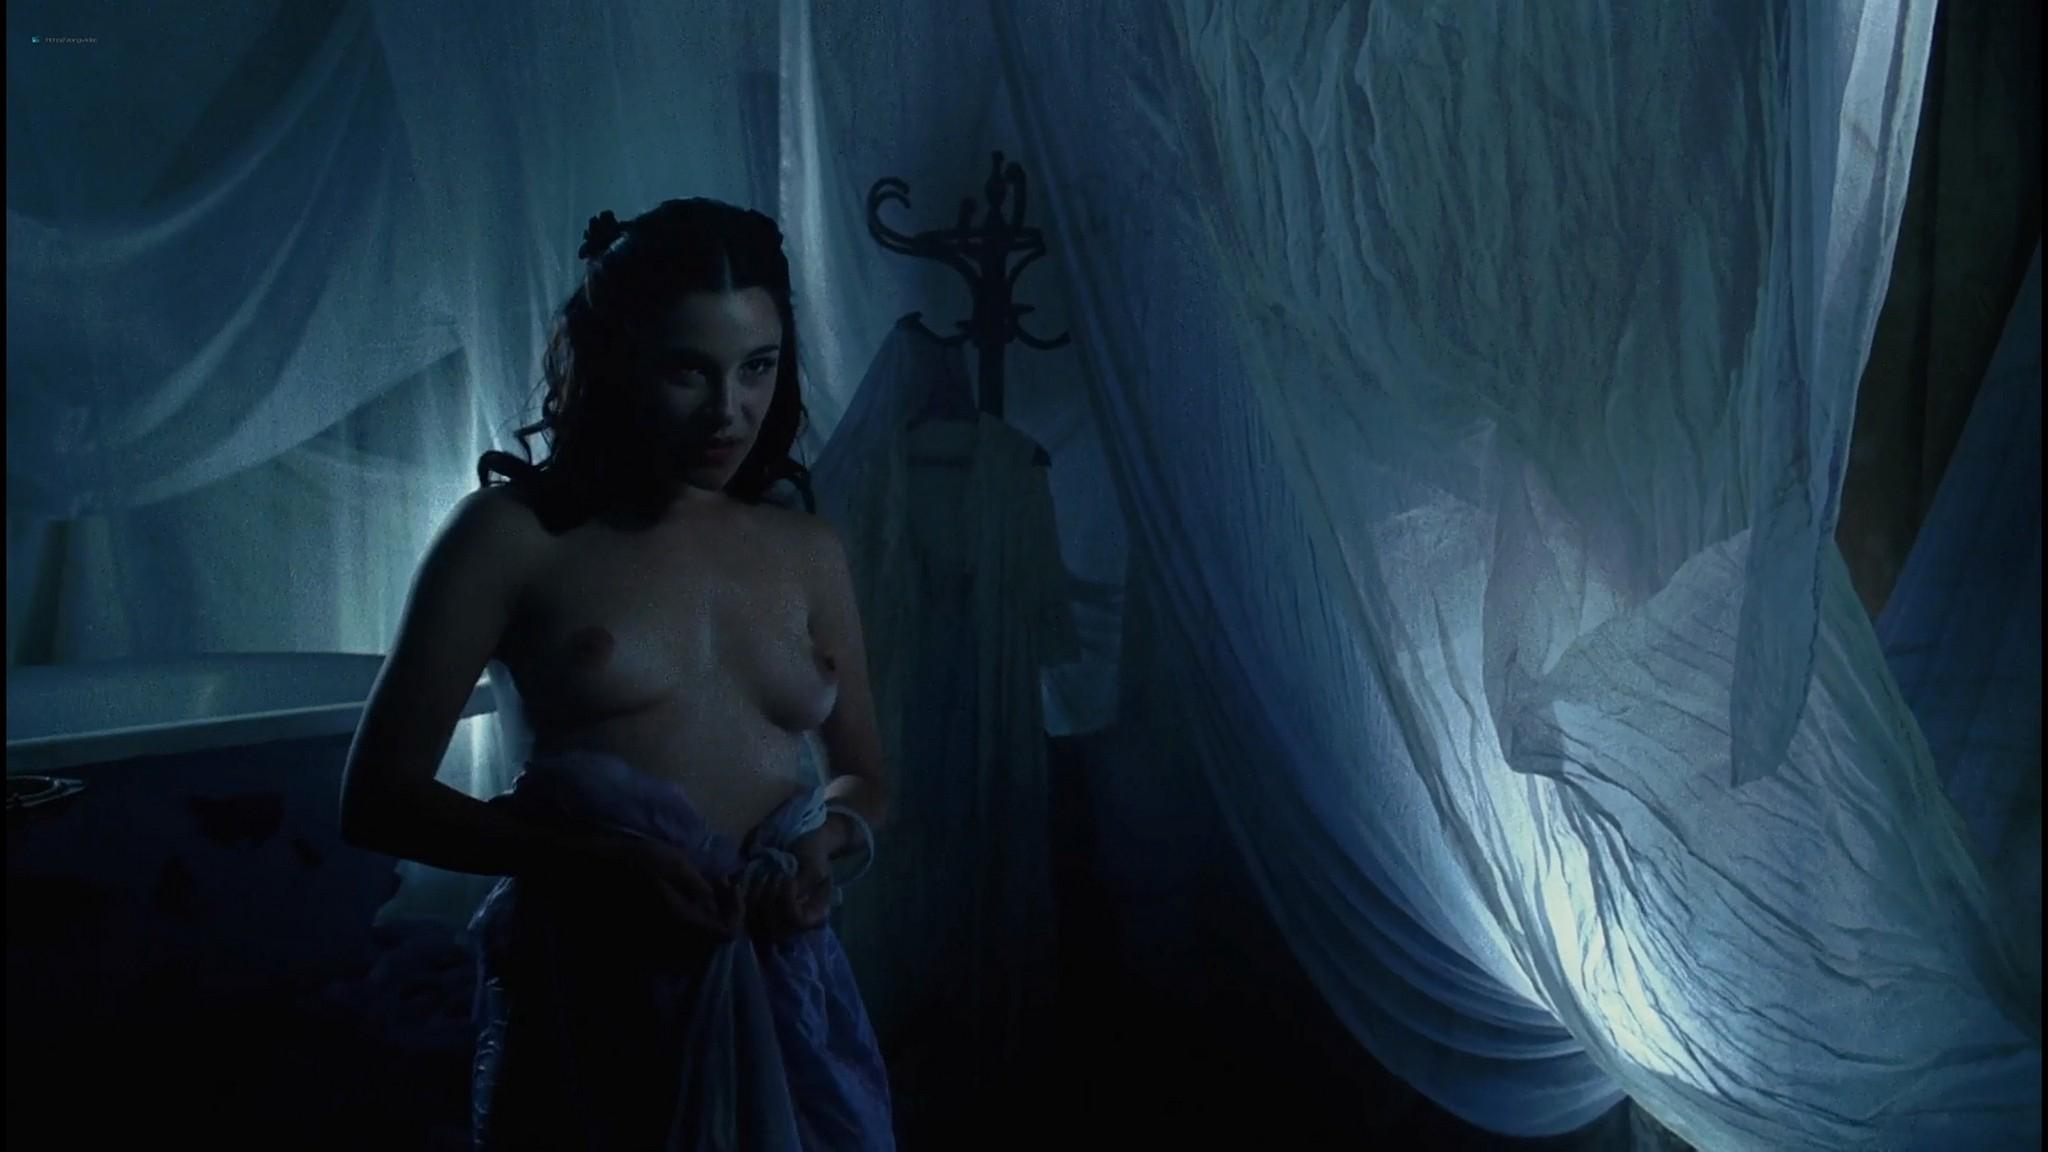 Serena Scott Thomas nude sex Sarah Lassez and others nude too Brothel 2008 1080p Web 19